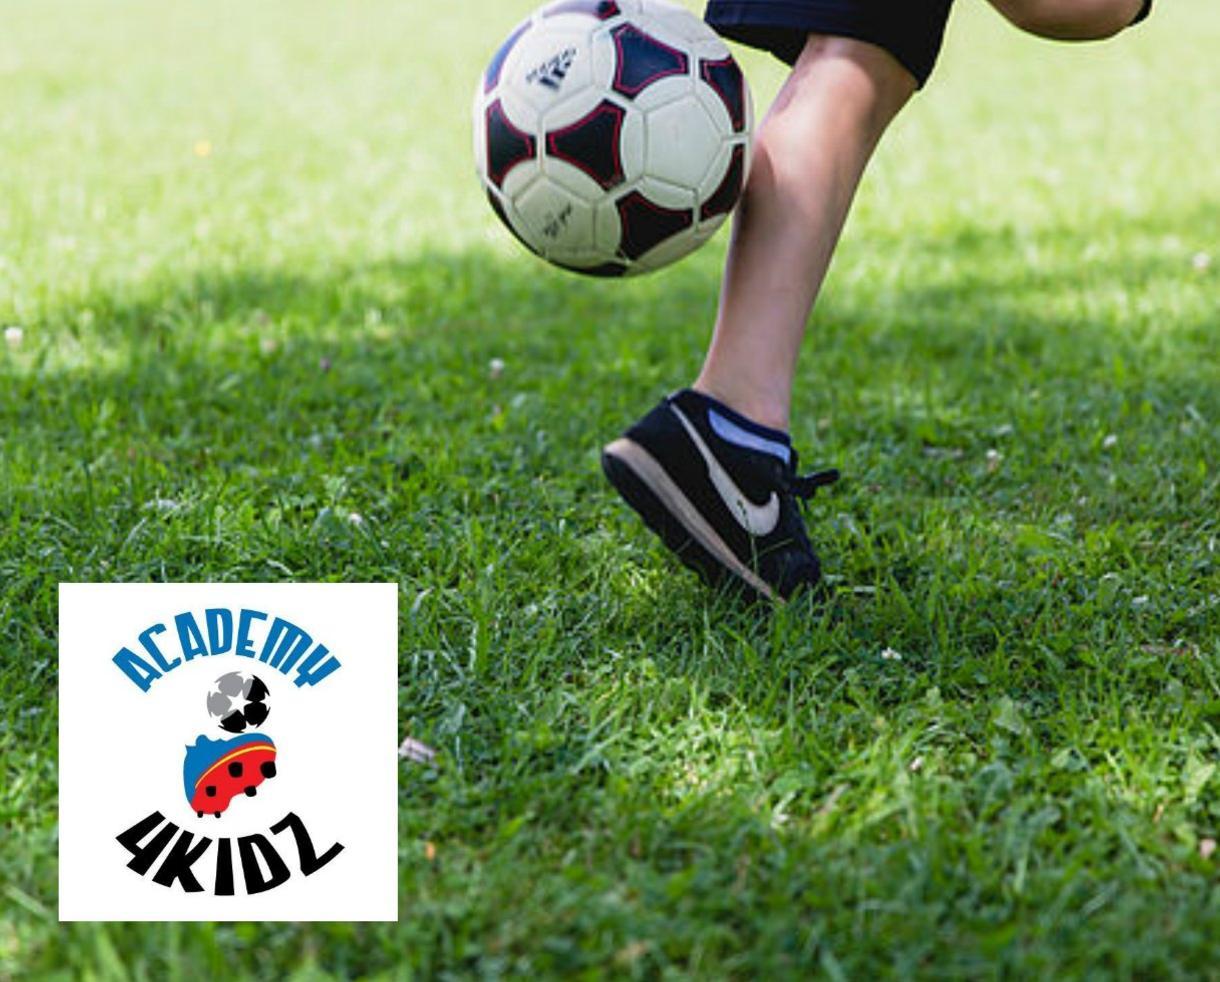 Academy 4 Kidz Soccer Camp